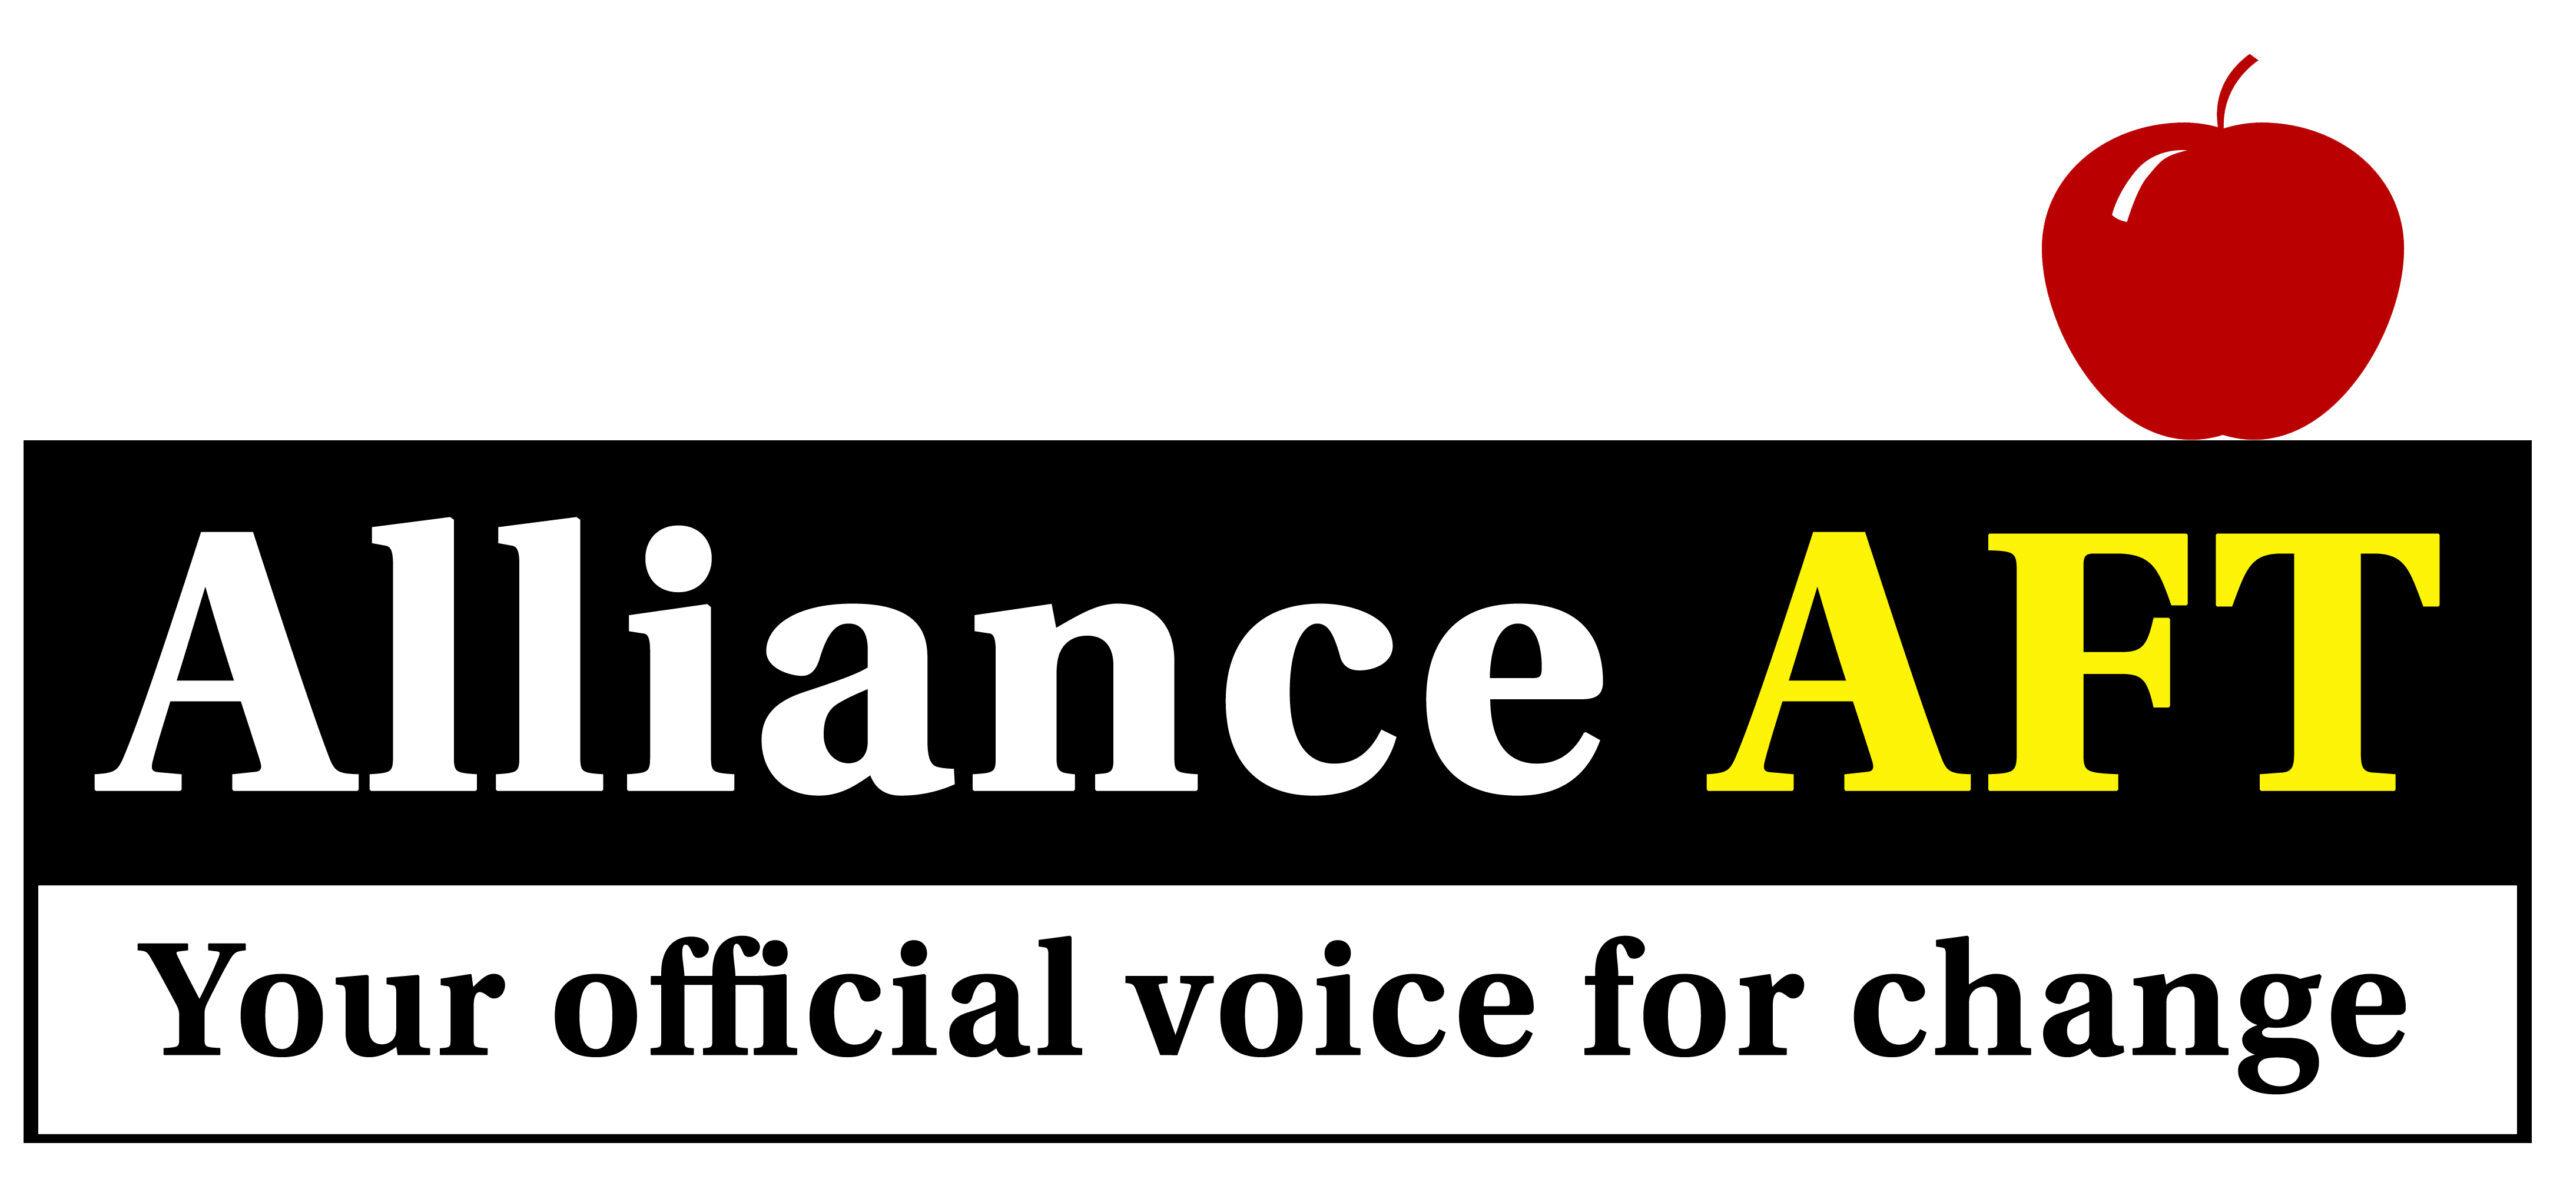 Alliance/AFT